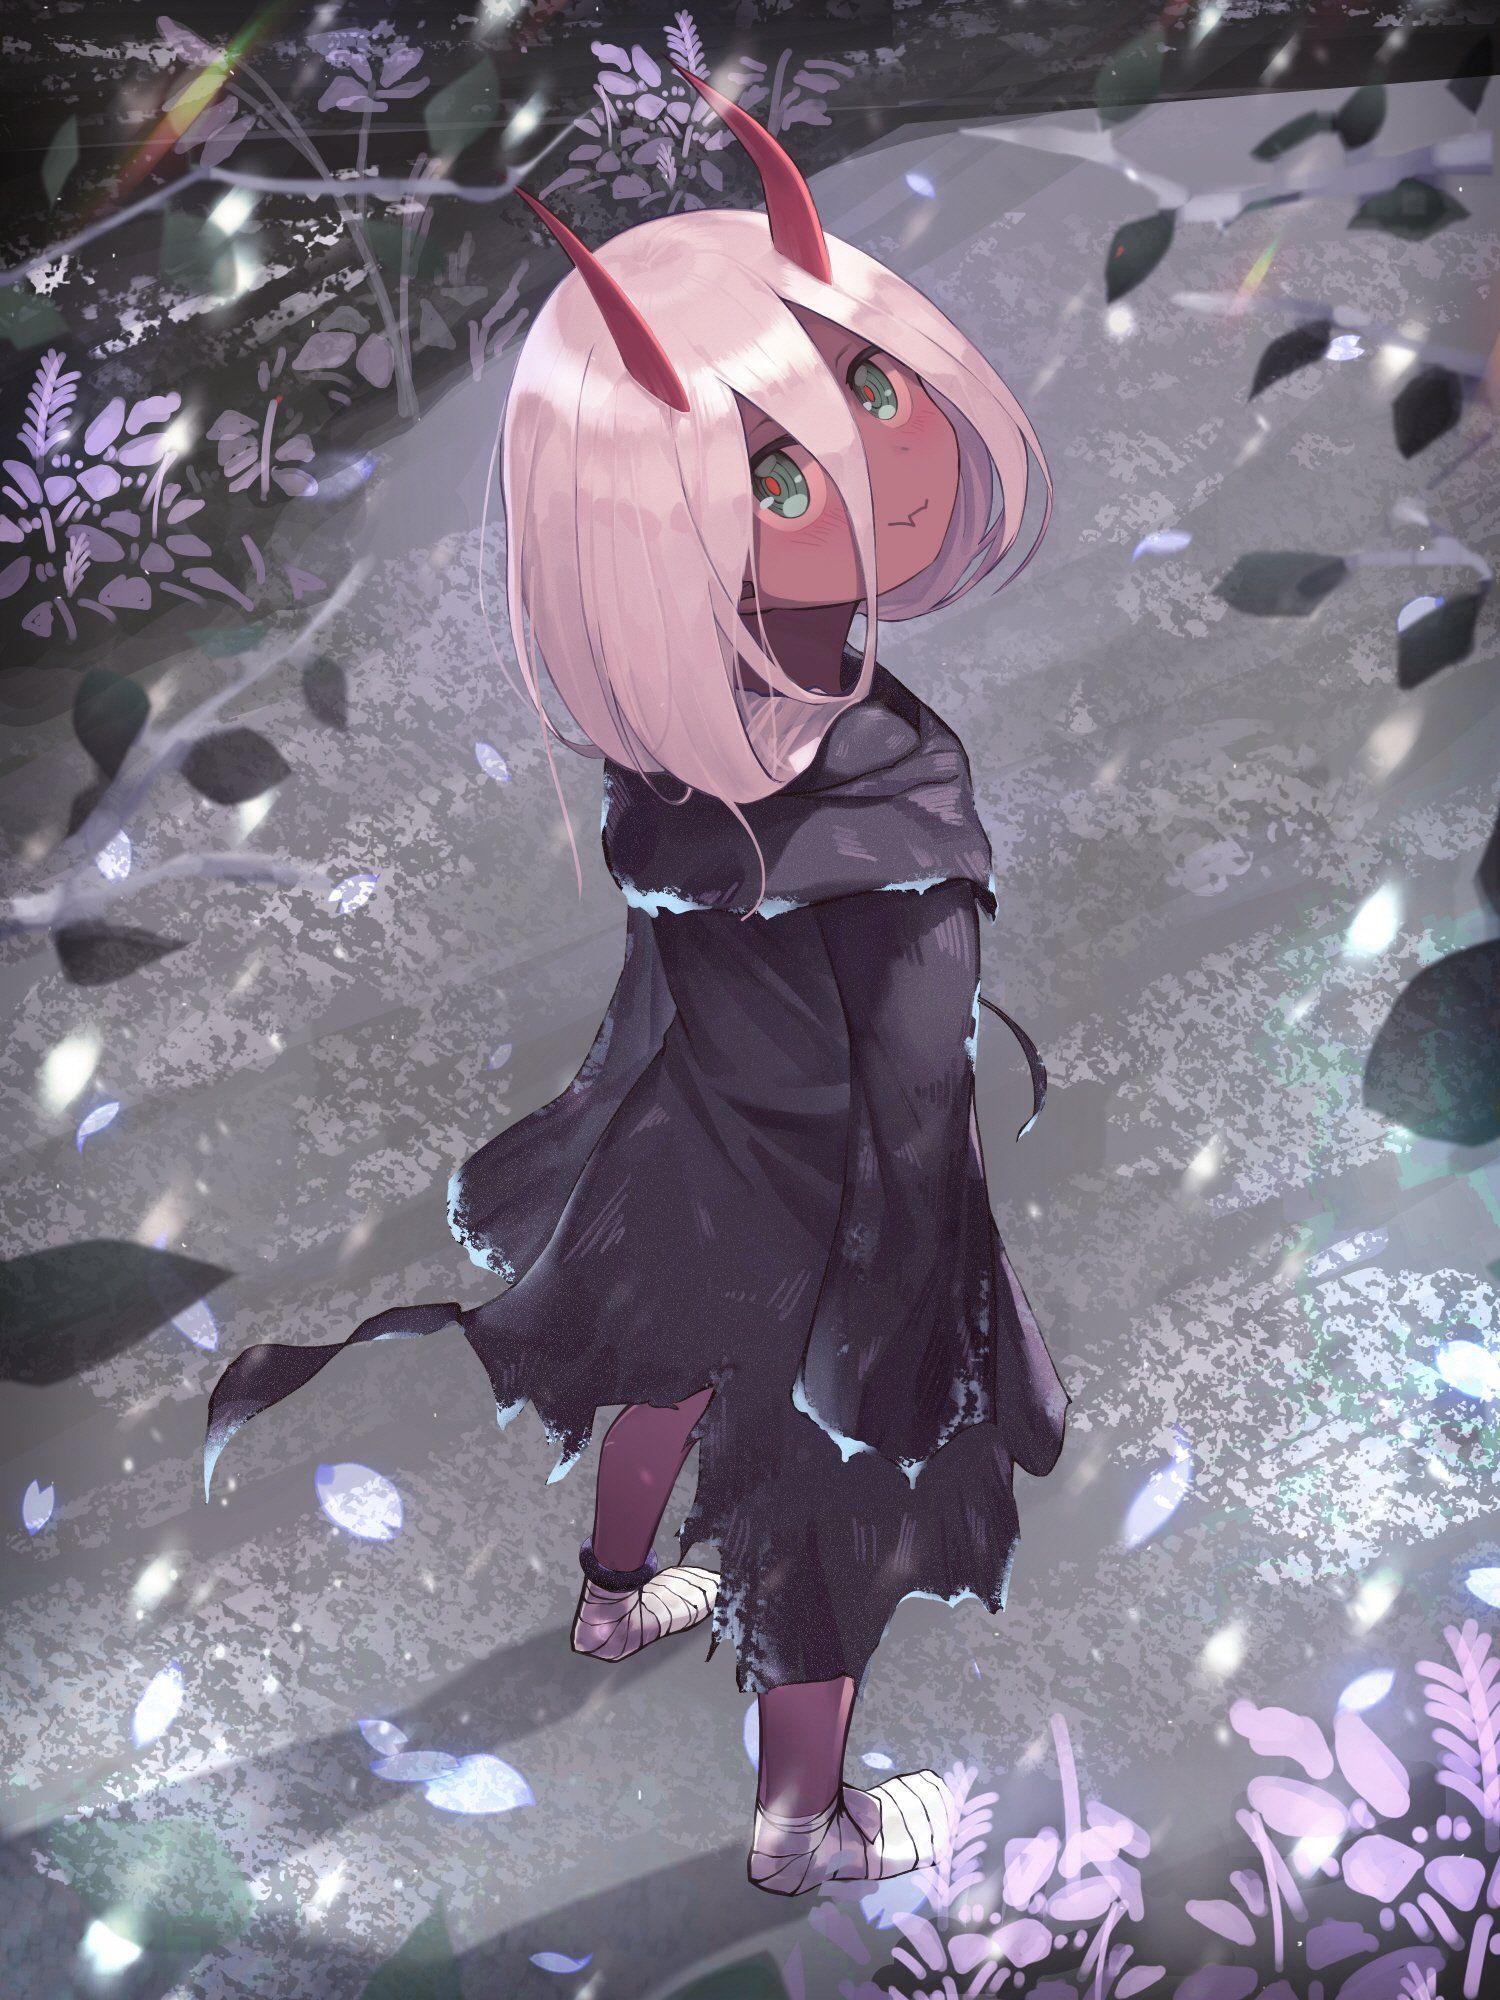 Anime Art on Twitter